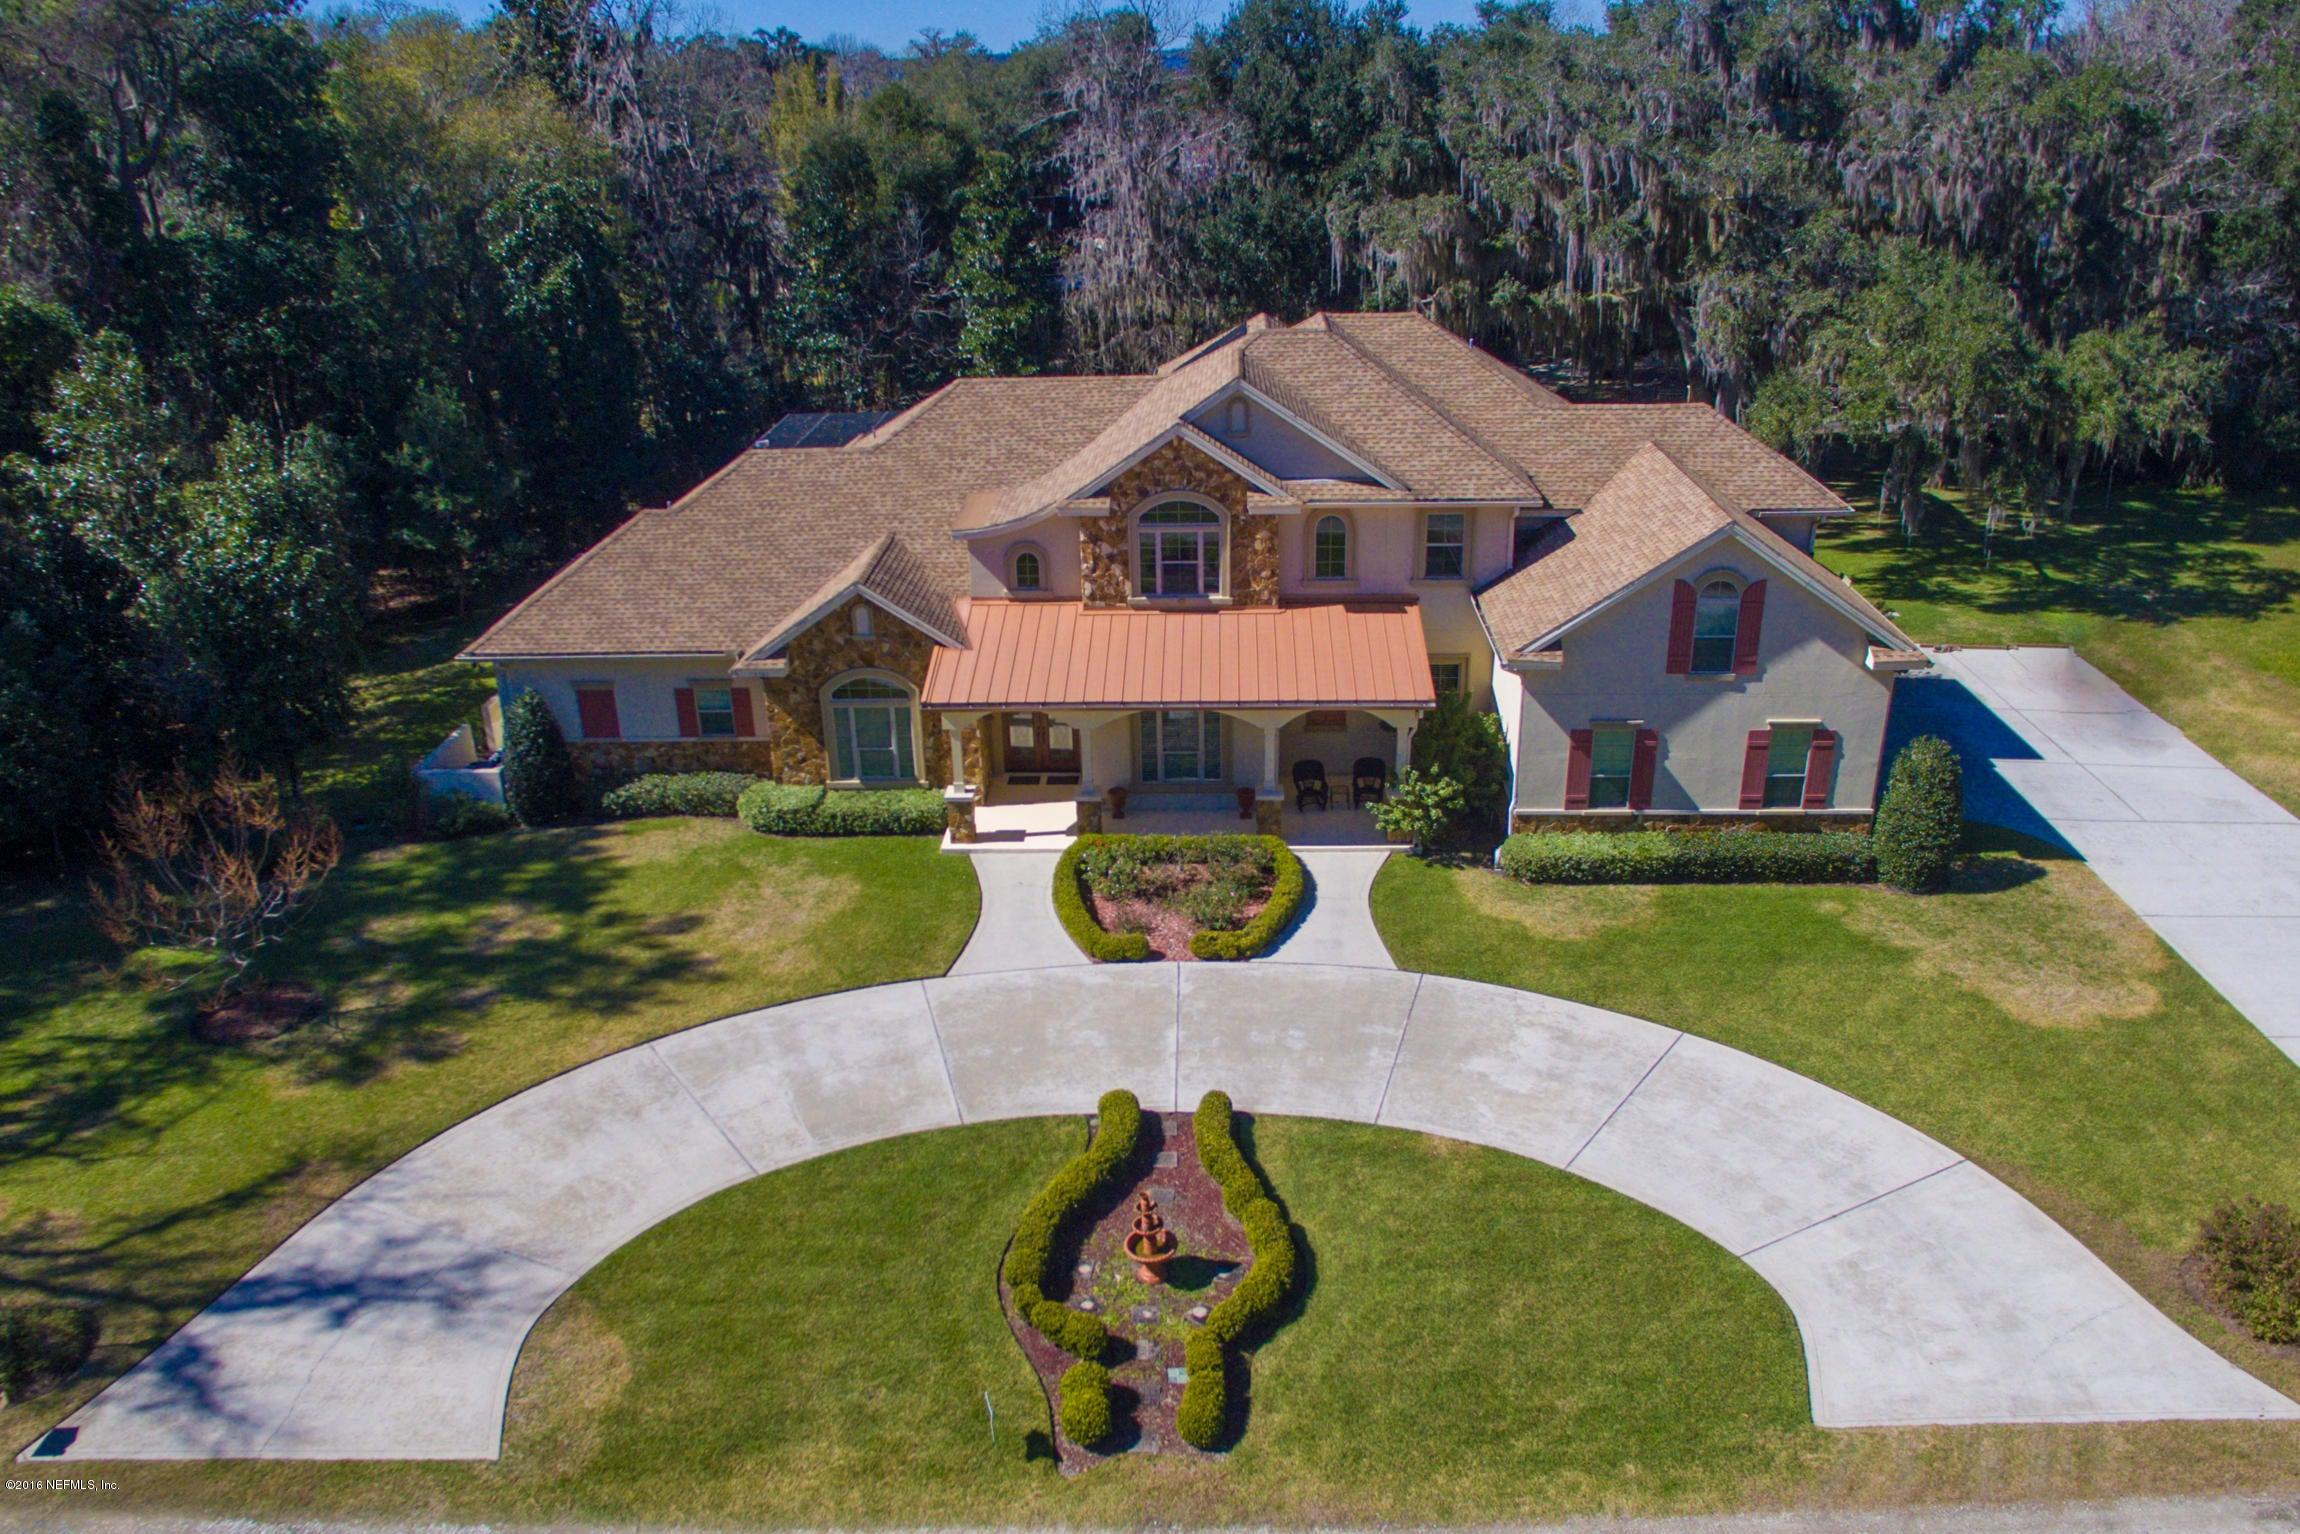 julington-creek-switzerland-real-estate |  1141 POPOLEE RD